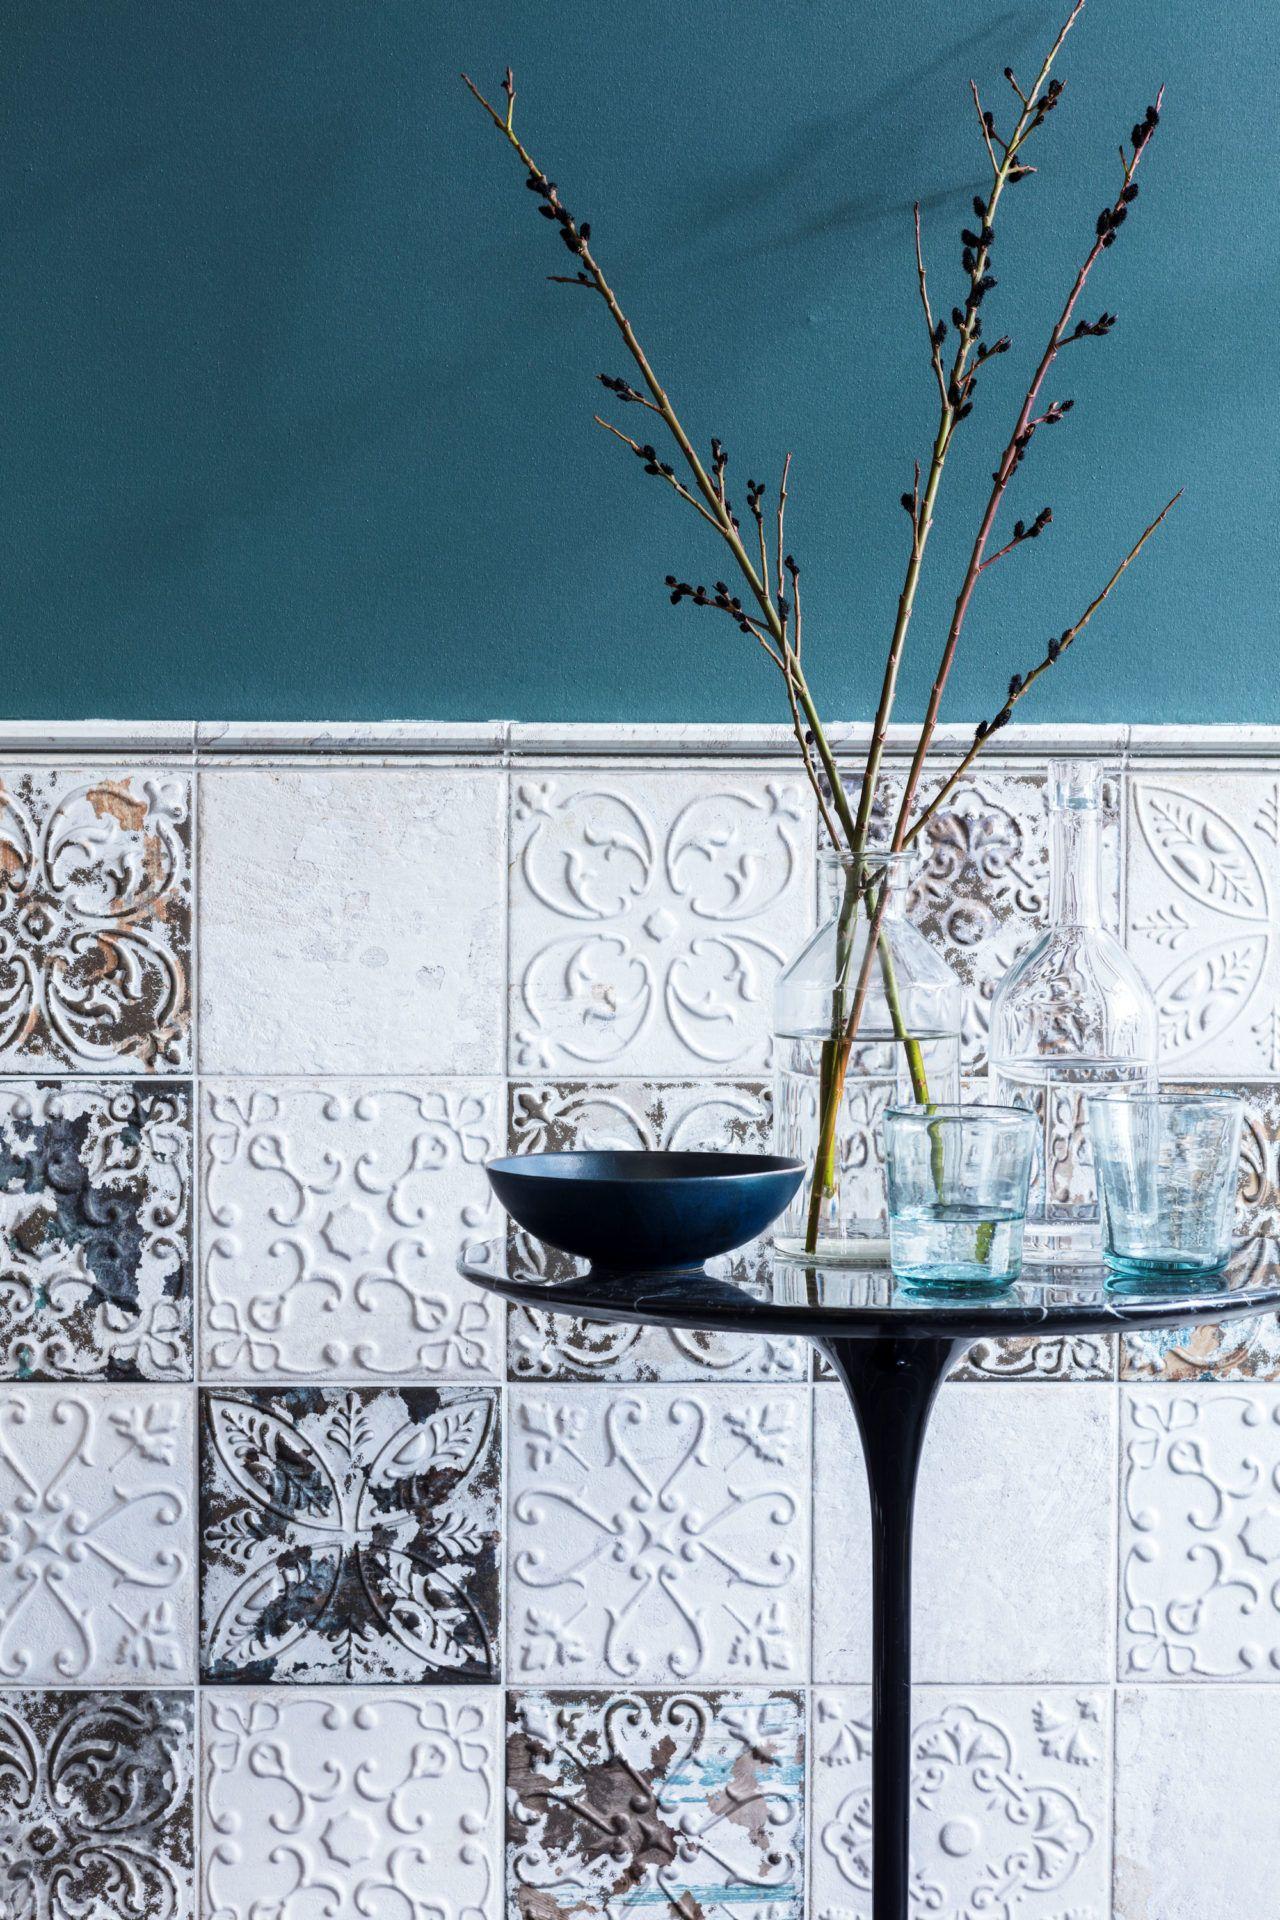 Demelza Tin Oxide Decor Decorative Collection | Cornice, Showroom ...